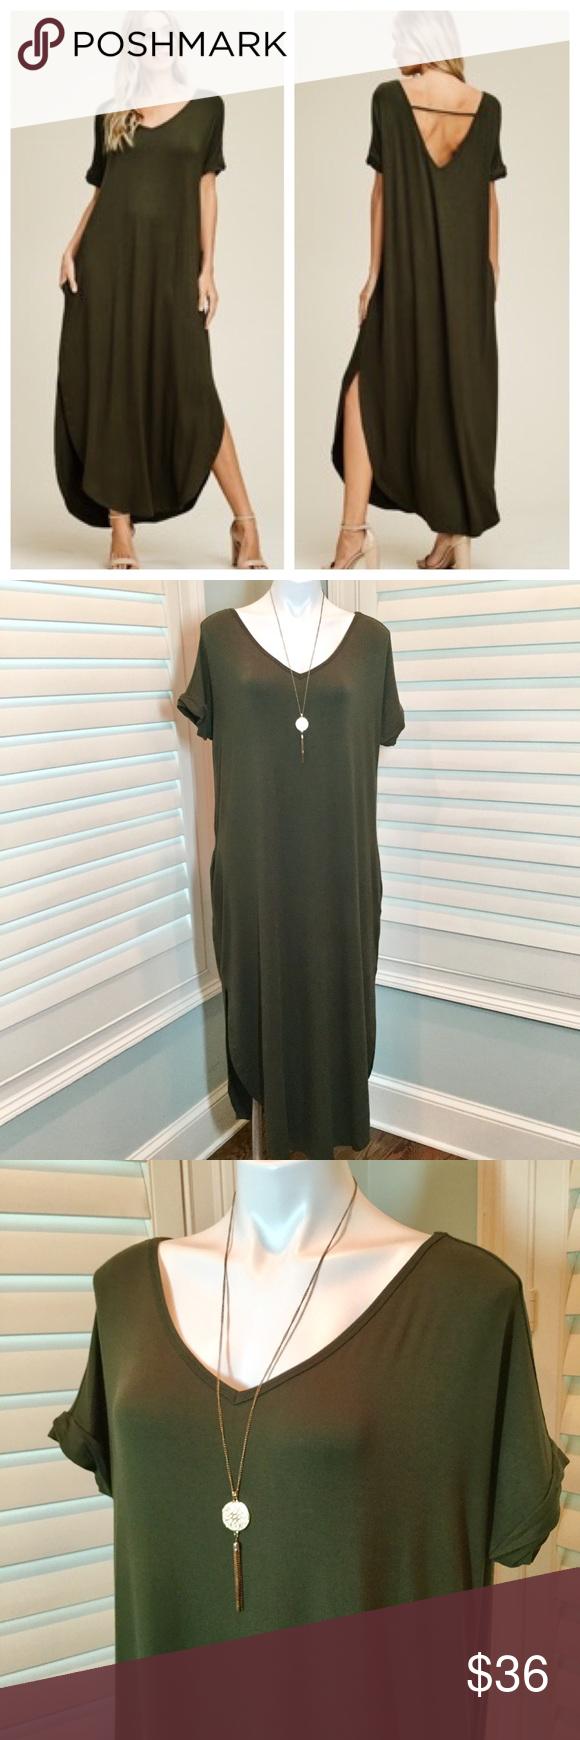 Sold Olive Oversized T Shirt Maxi Dress L Maxi Shirt Dress Clothes Design Oversized Tshirt [ 1740 x 580 Pixel ]